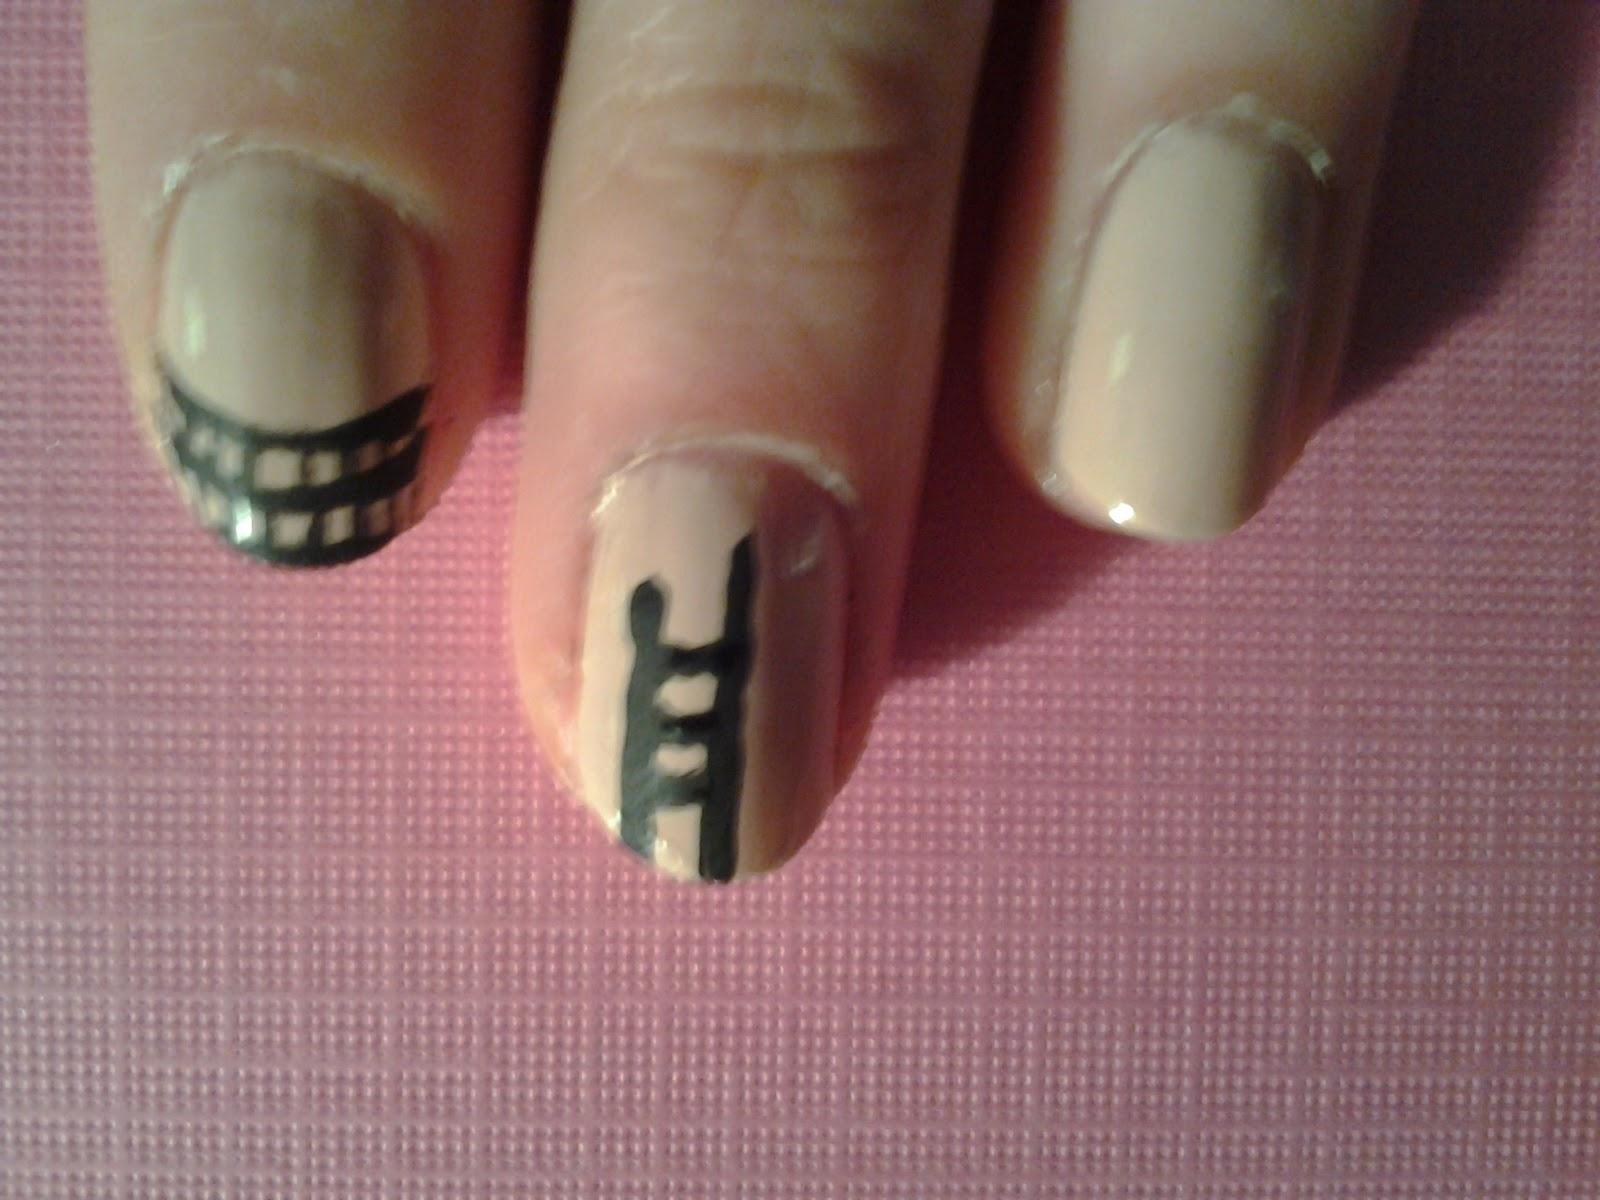 NAILHOLICS UNITE!: A-Bridged Nails Tutorial